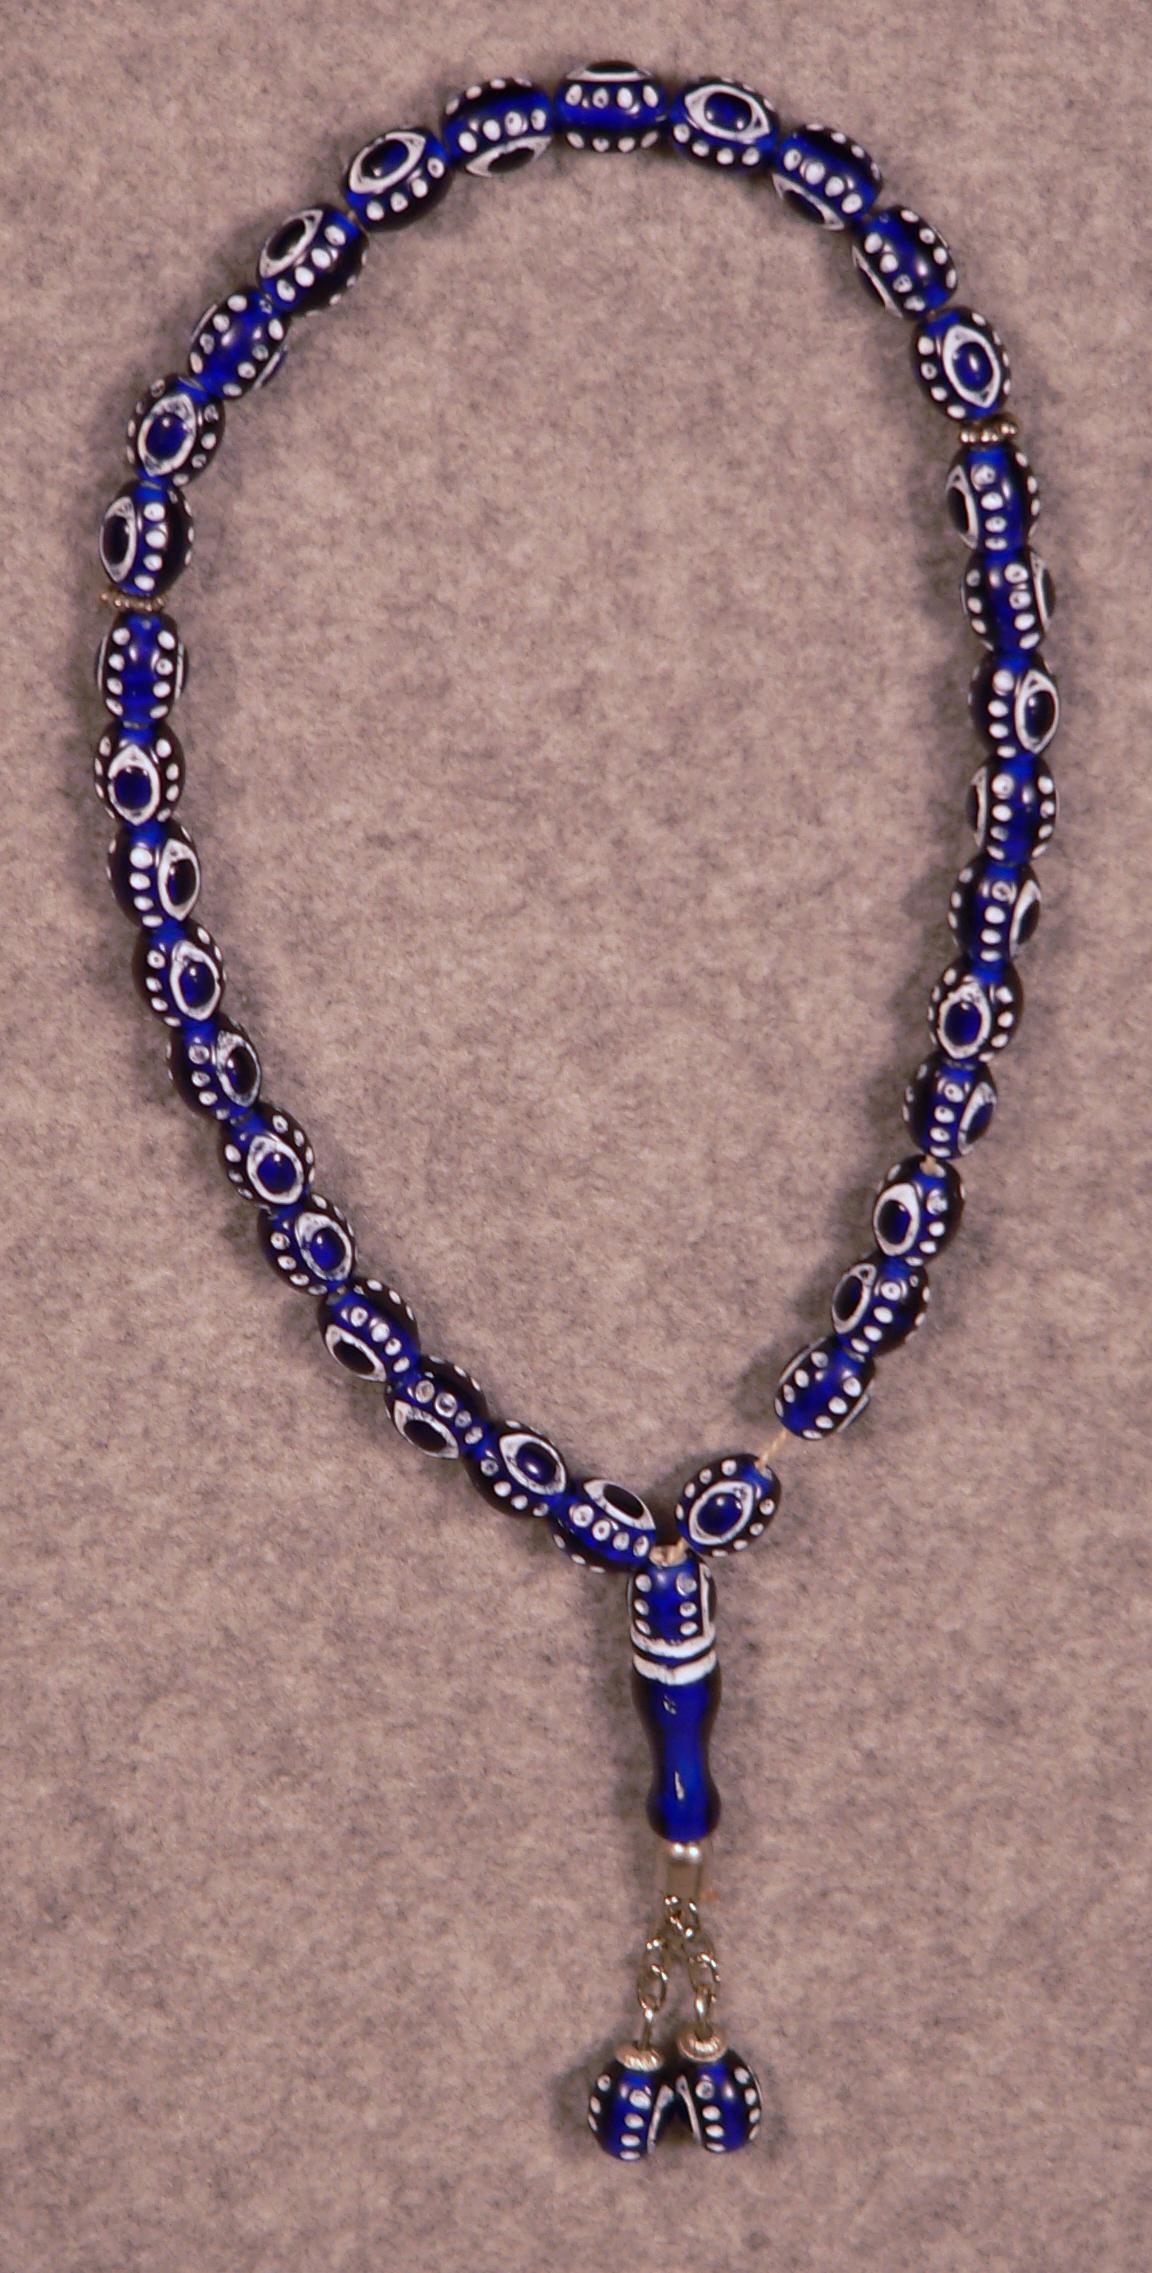 Prayer beads - Wikipedia